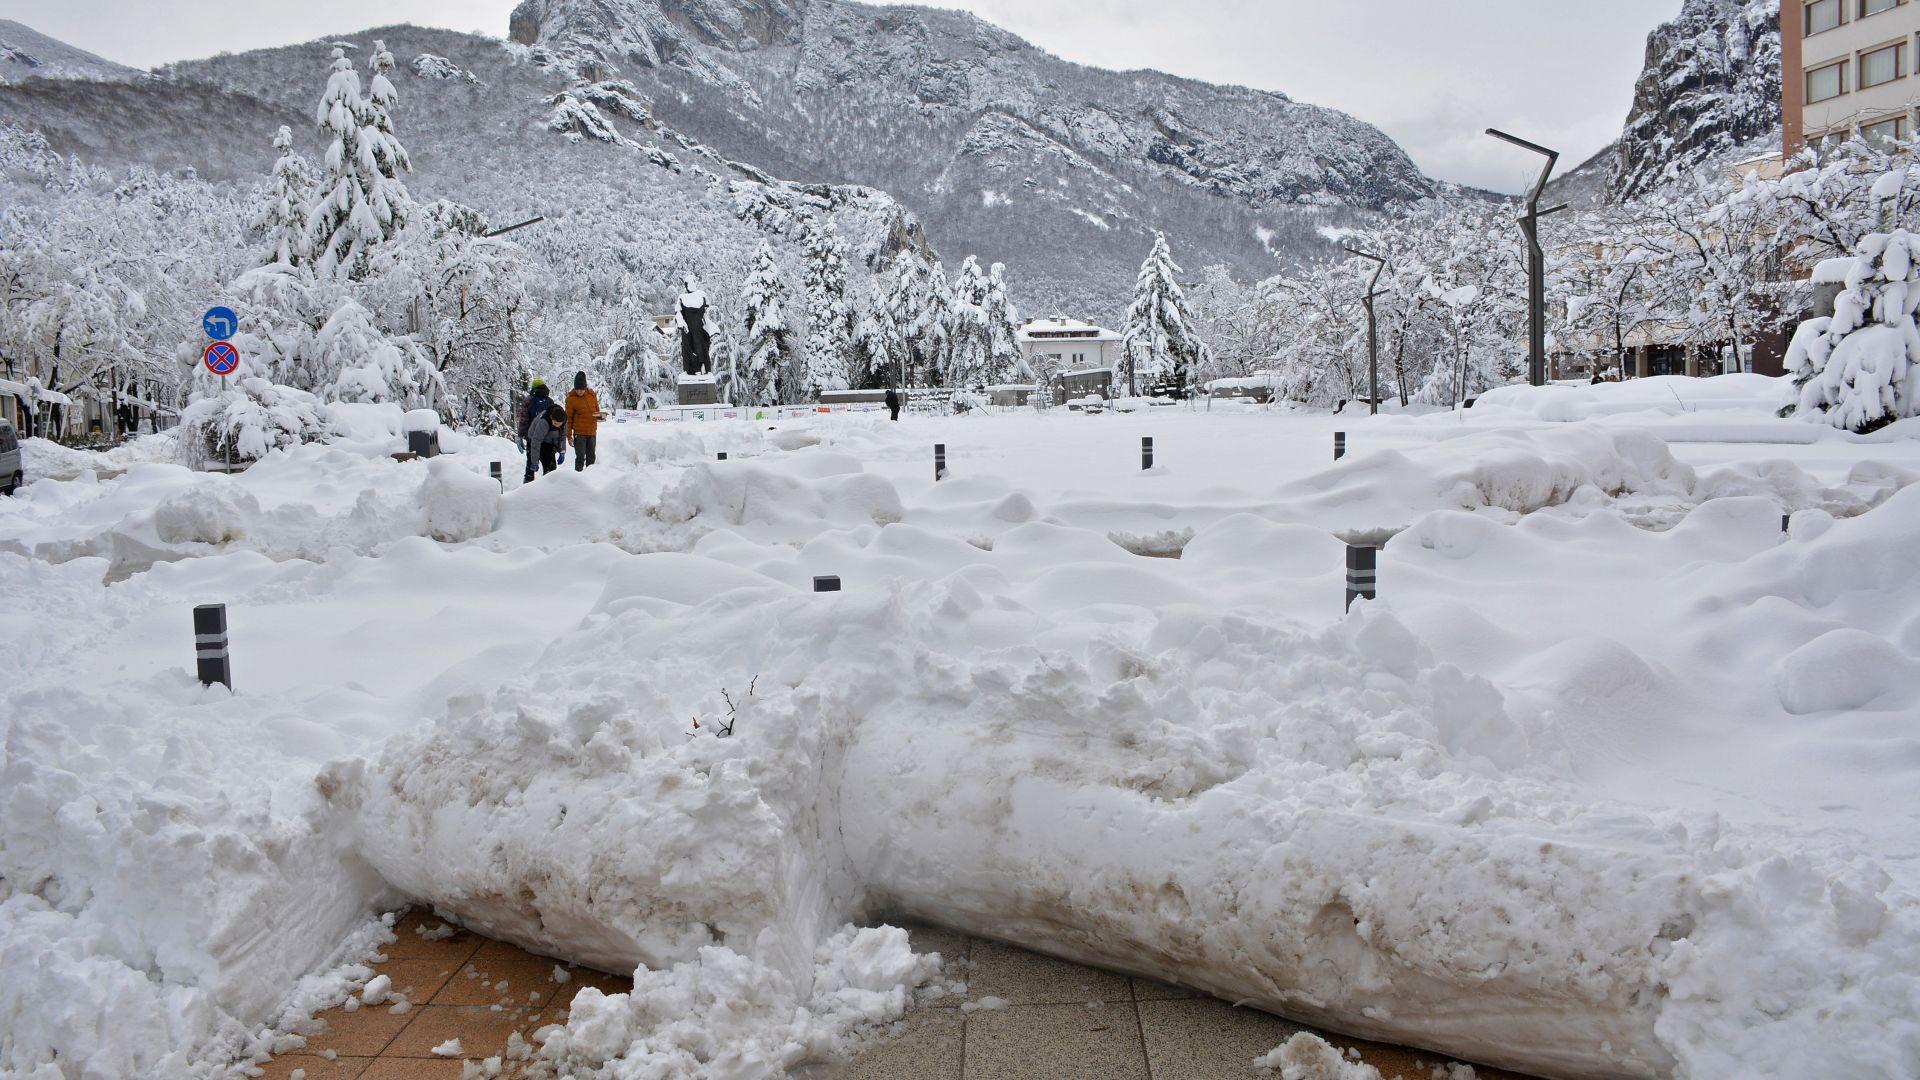 Туристи са блокирани заради снега в Родопите, идва леден уикенд